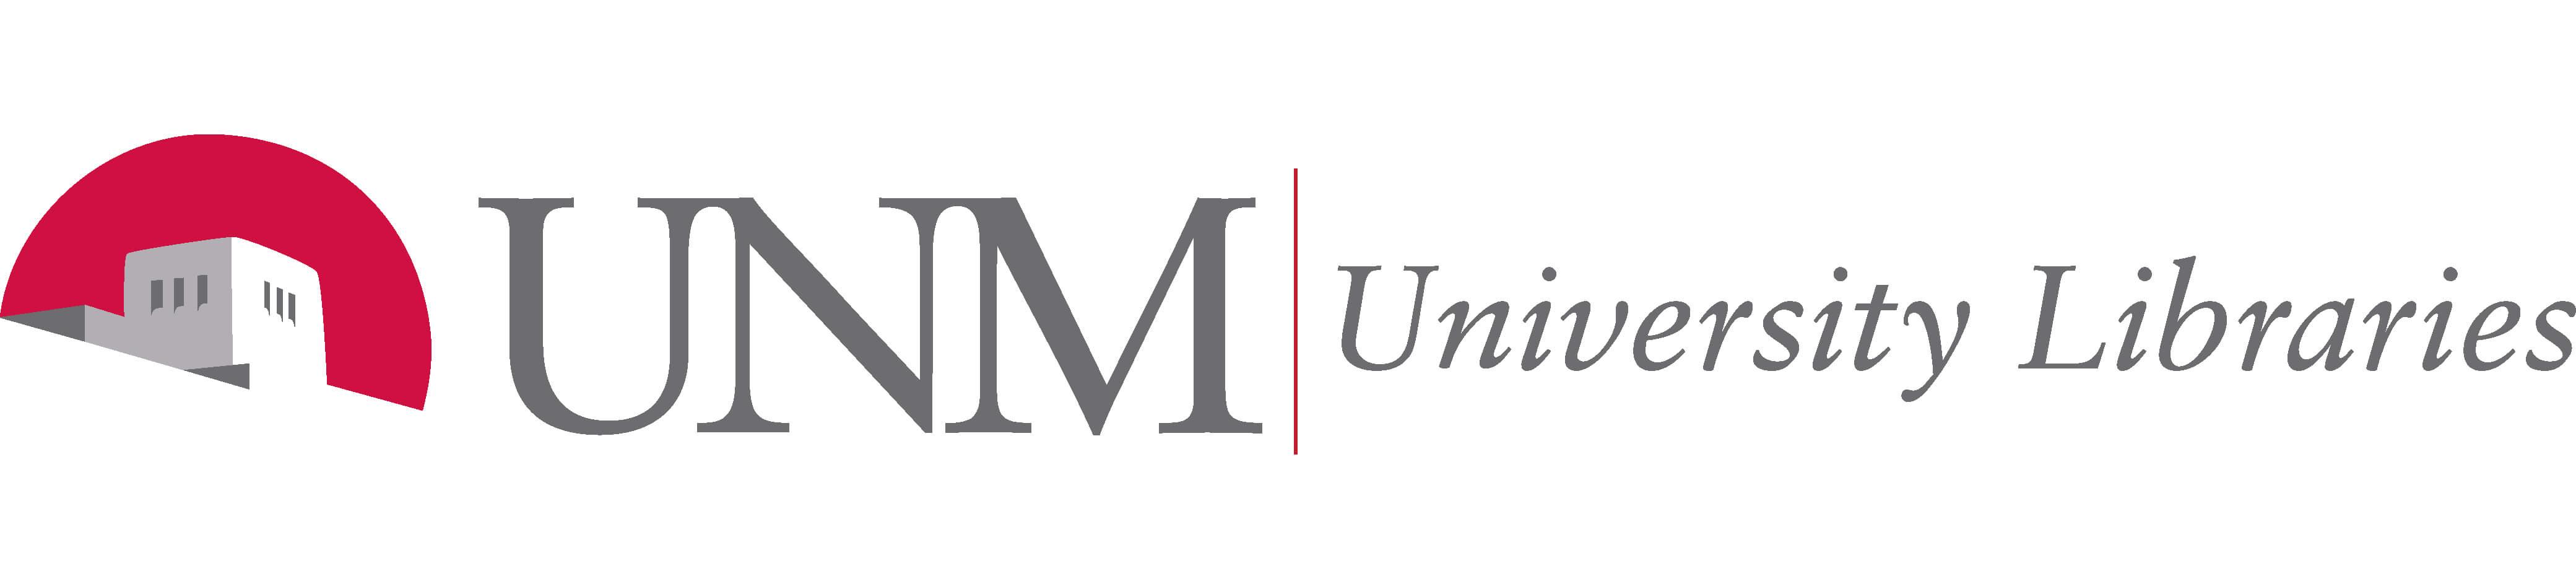 UNM-logo